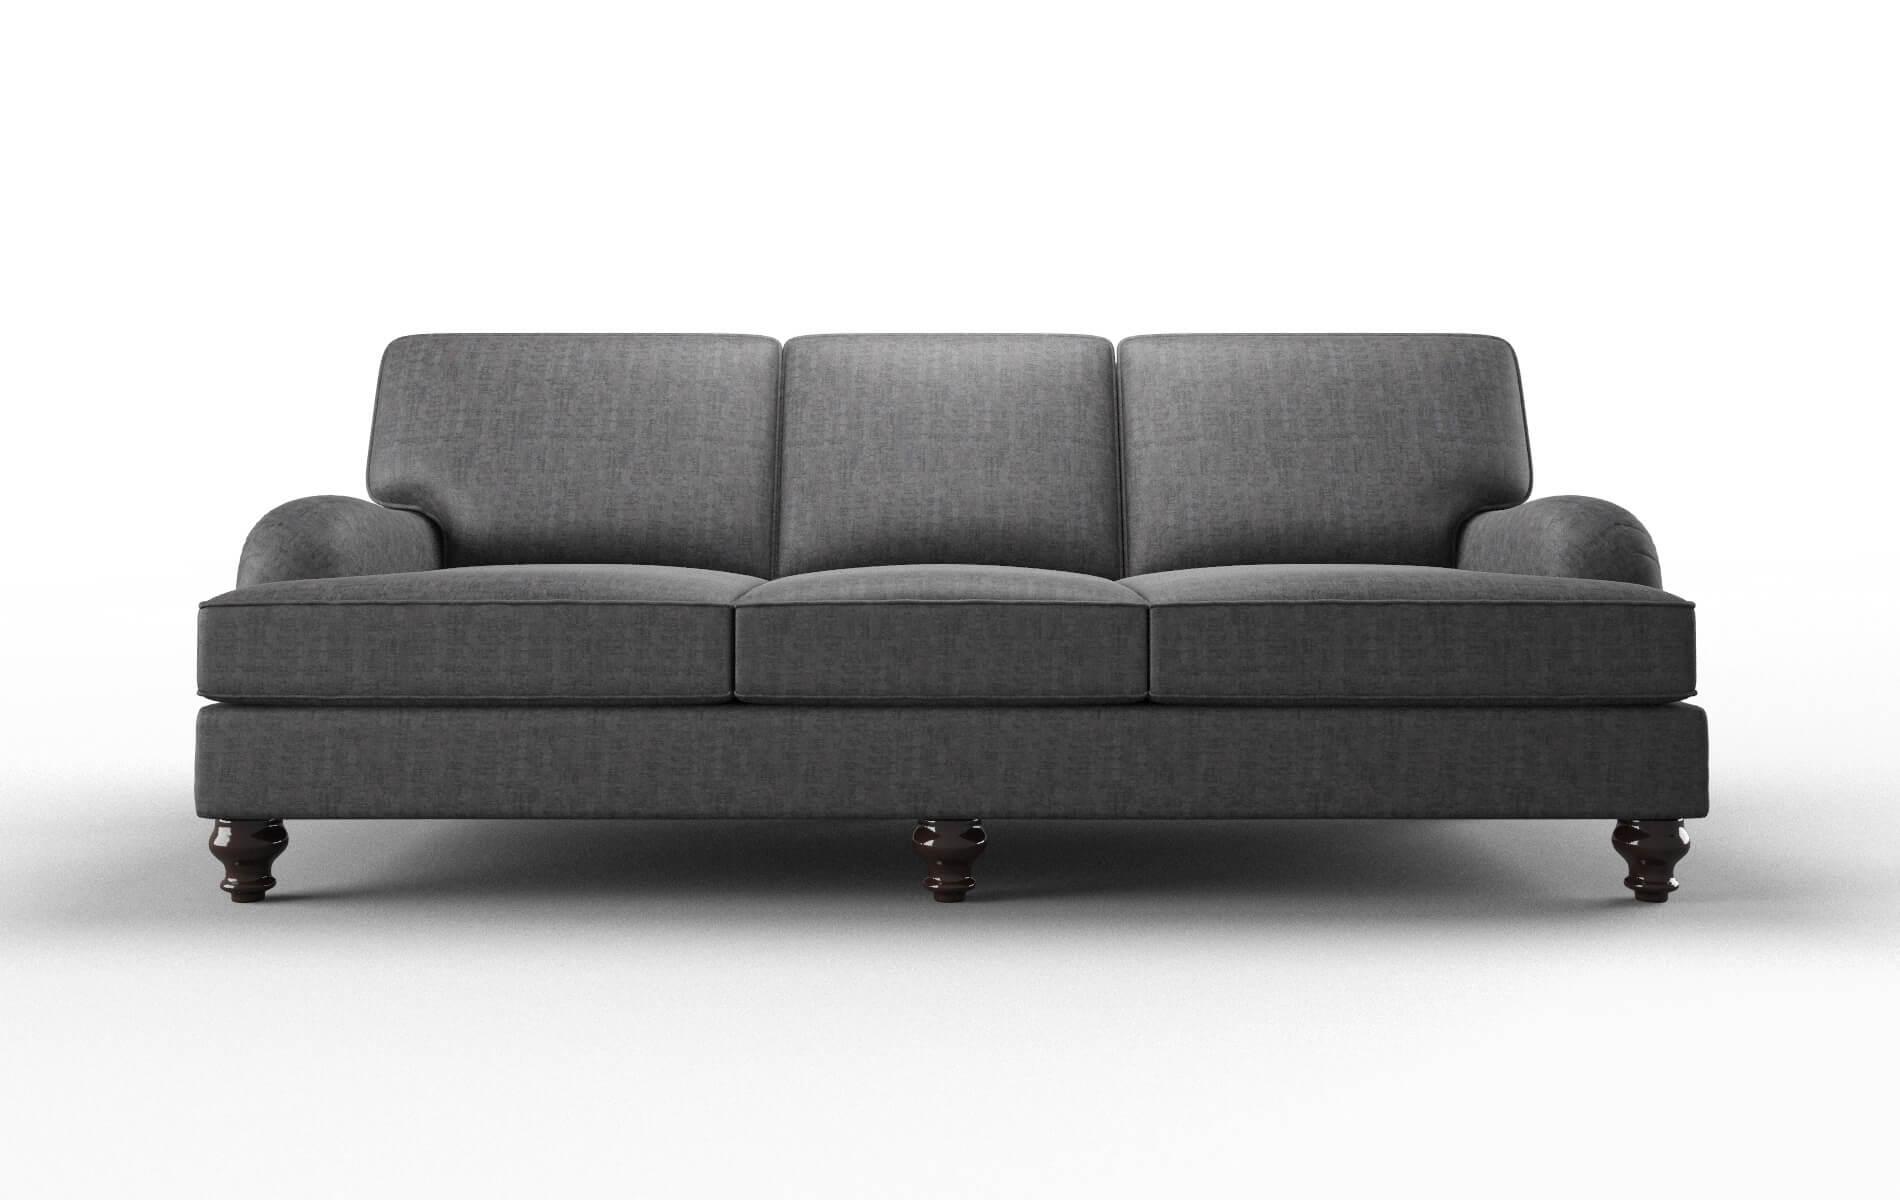 Peachy Hamilton Marcy Baltic Sofa Dreamsofa Machost Co Dining Chair Design Ideas Machostcouk